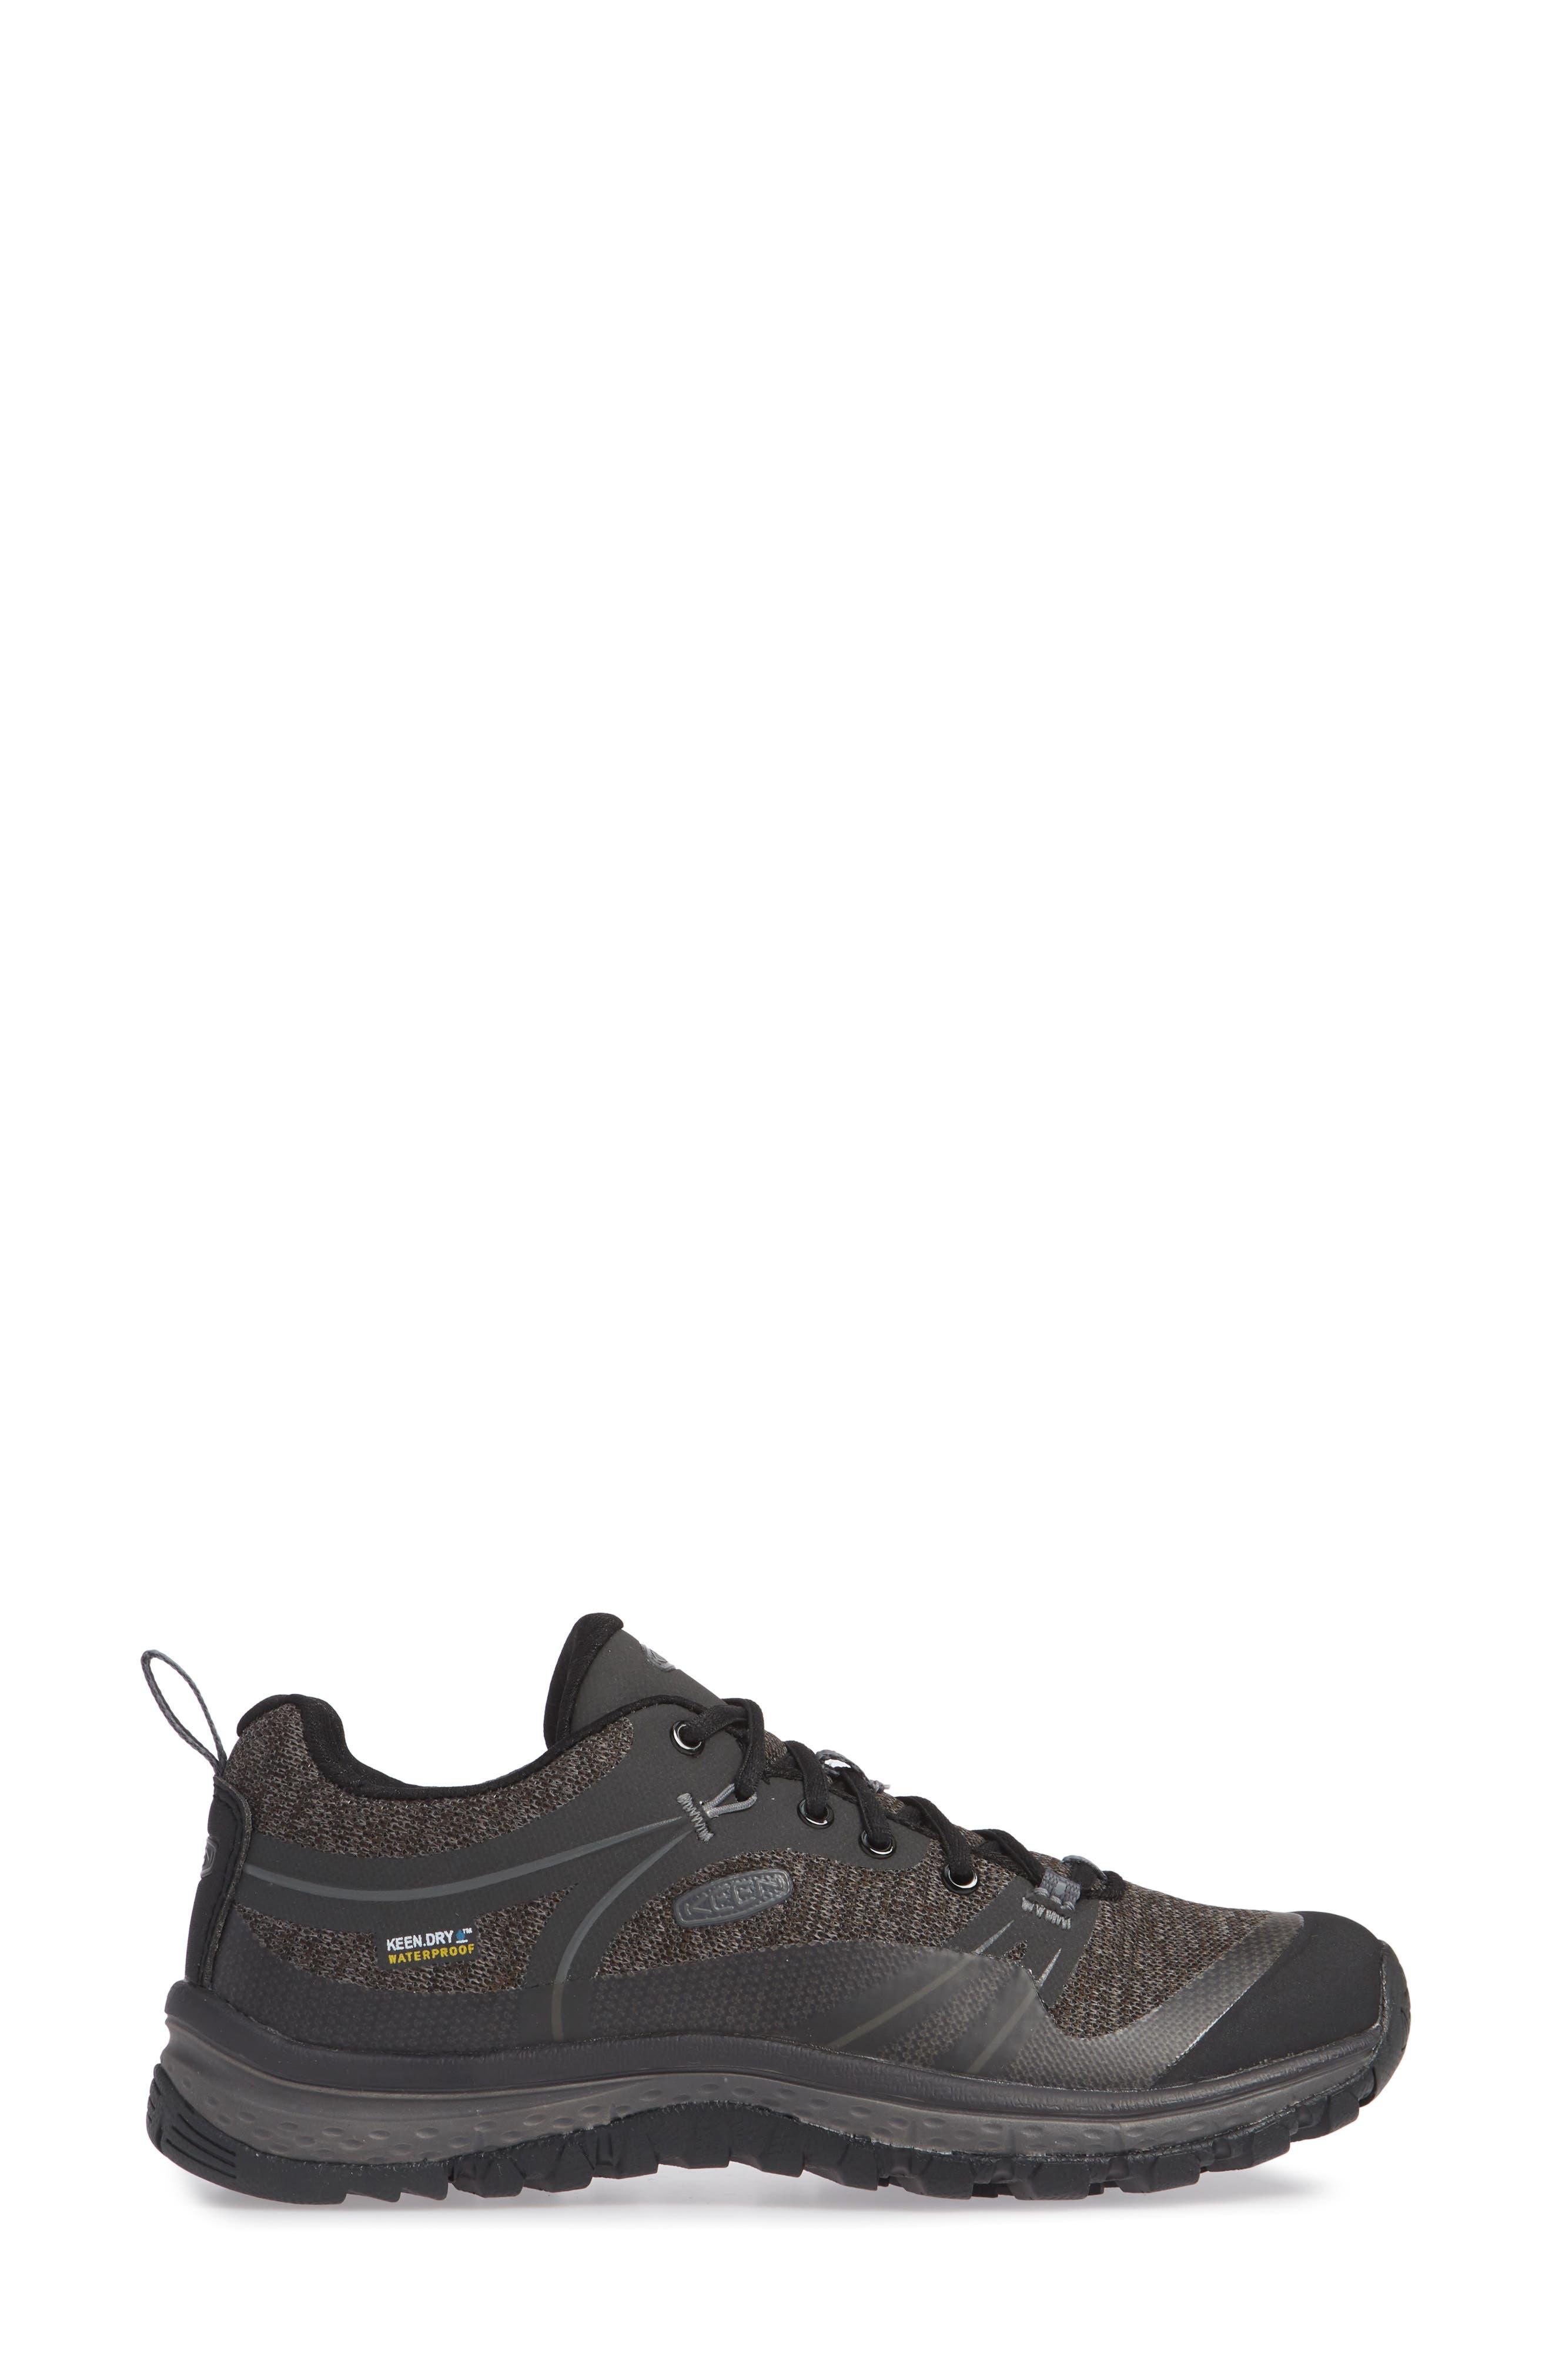 KEEN, Terradora Hiking Waterproof Sneaker, Alternate thumbnail 3, color, RAVEN/ GARGOYLE